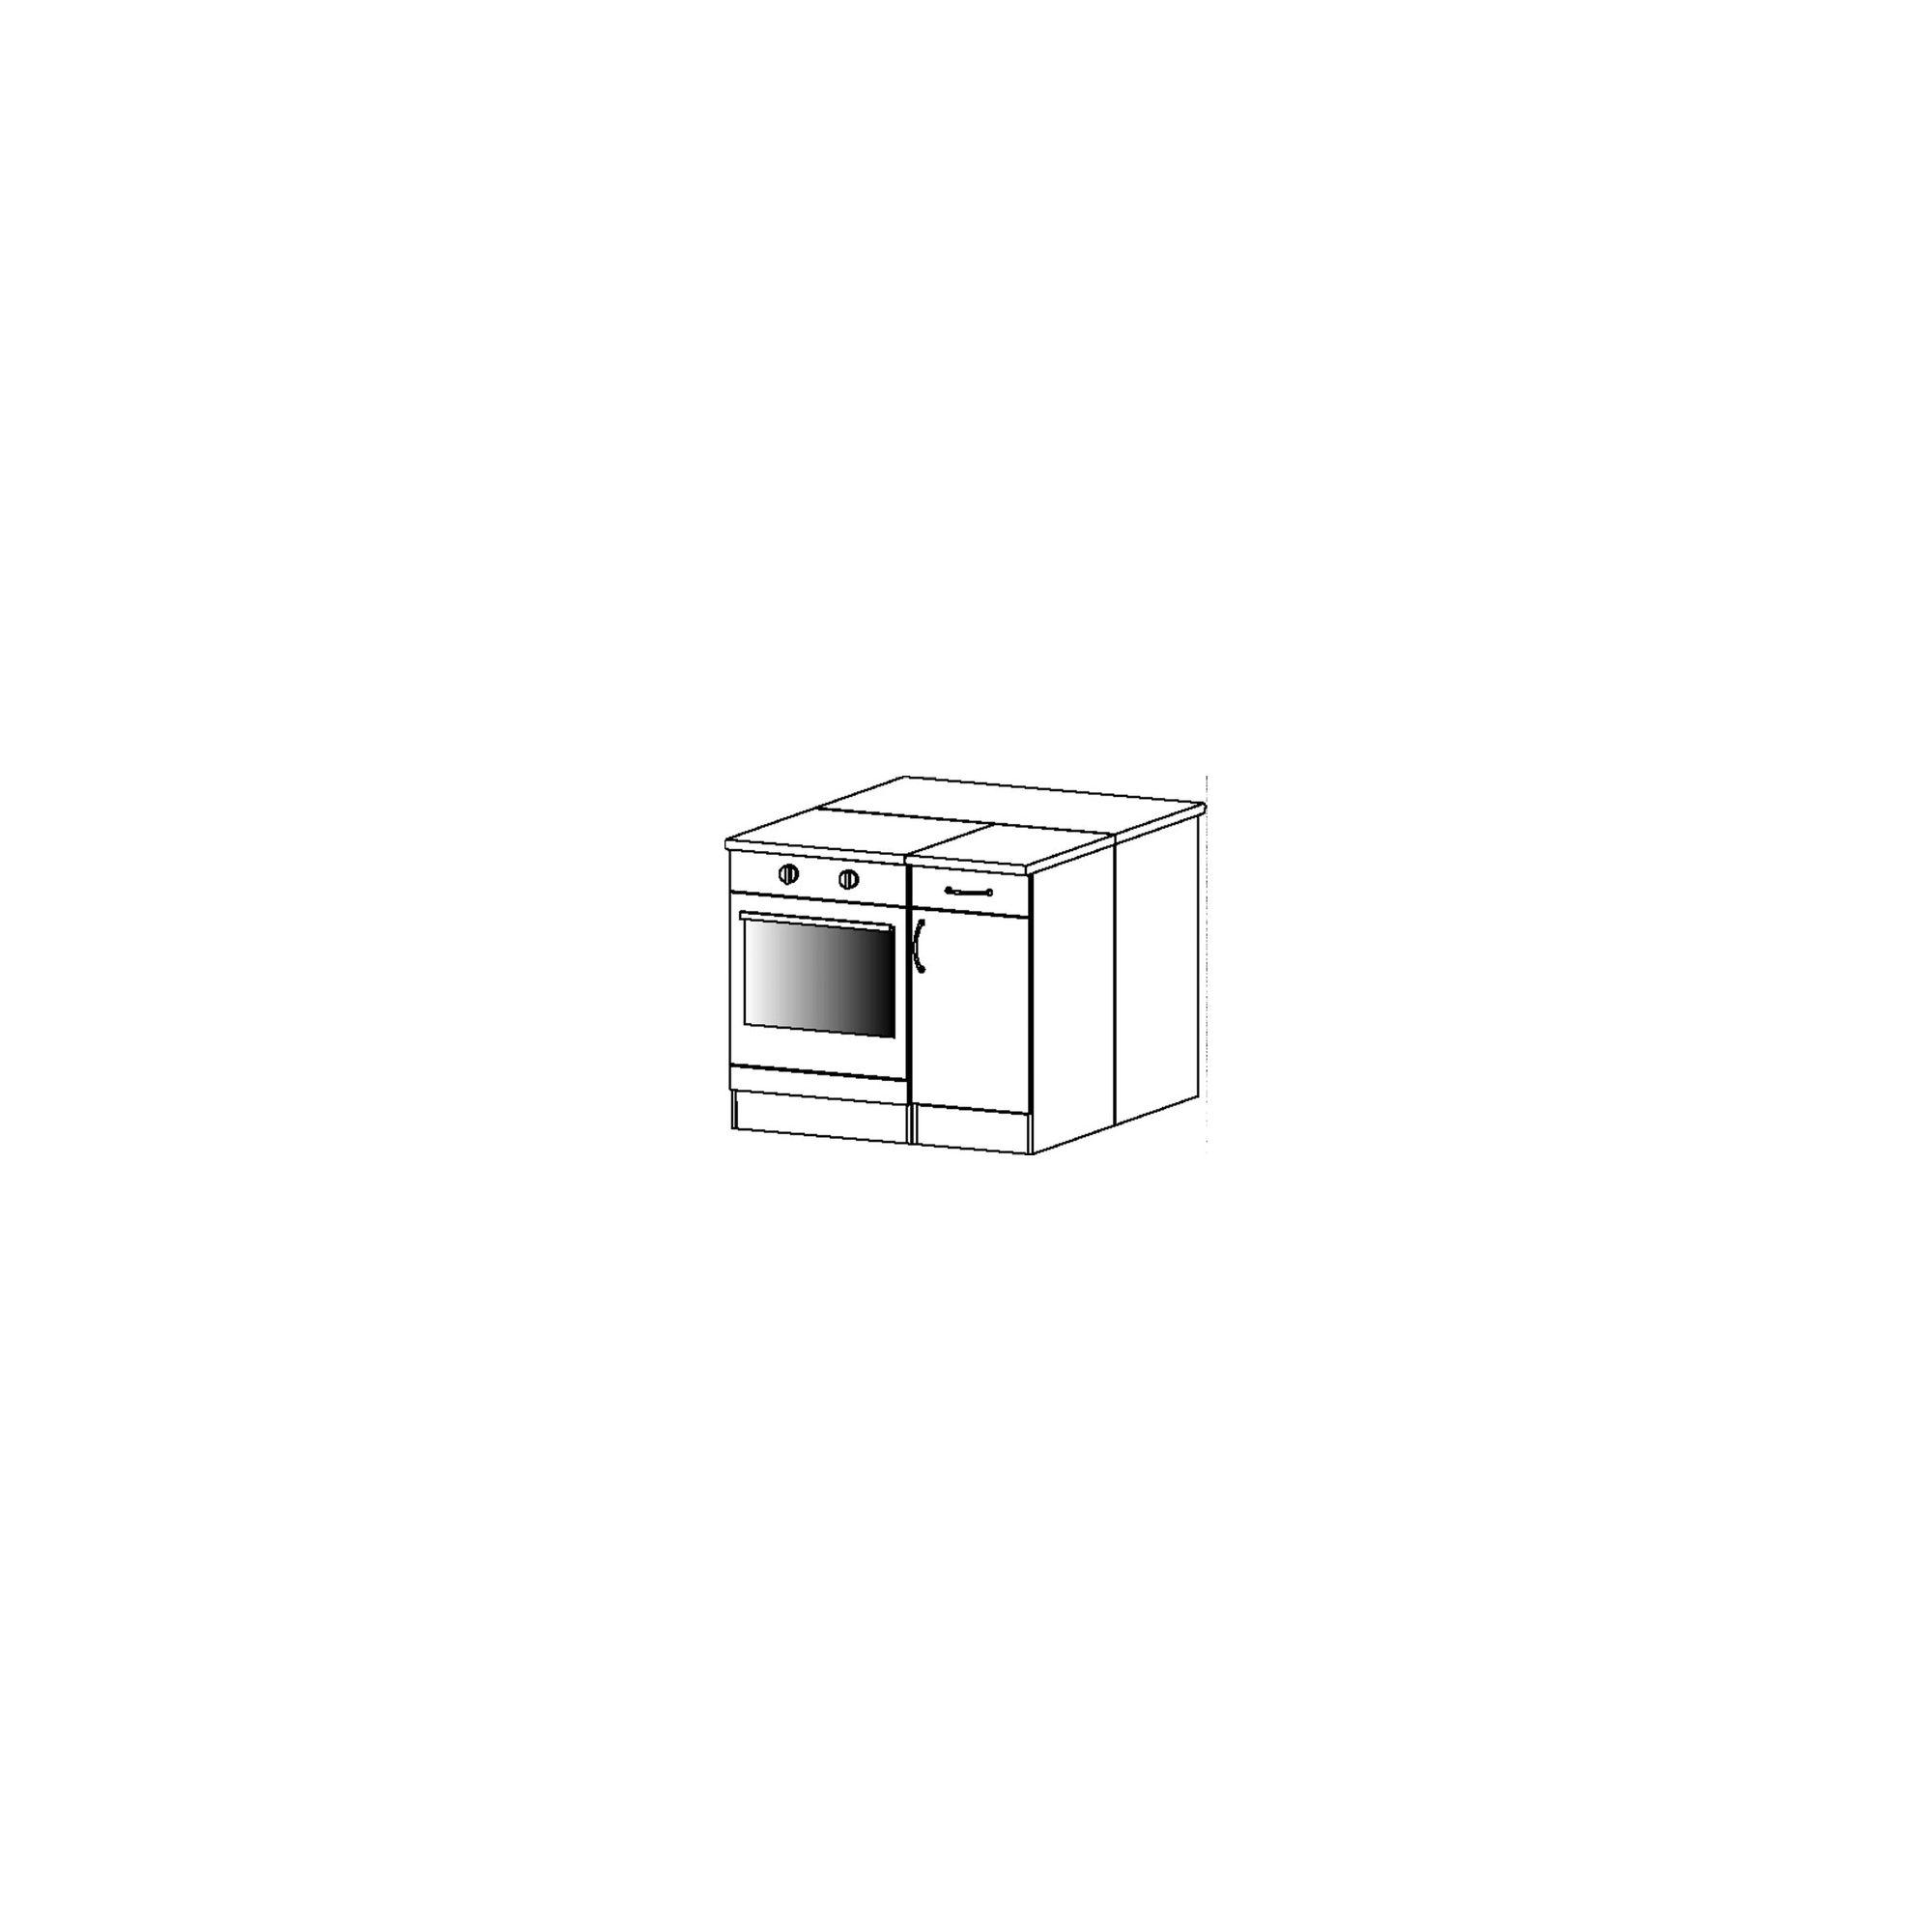 Tvilum Minima Combination 15 - Combination of Light Maple and Aluminium Grey at Tesco Direct